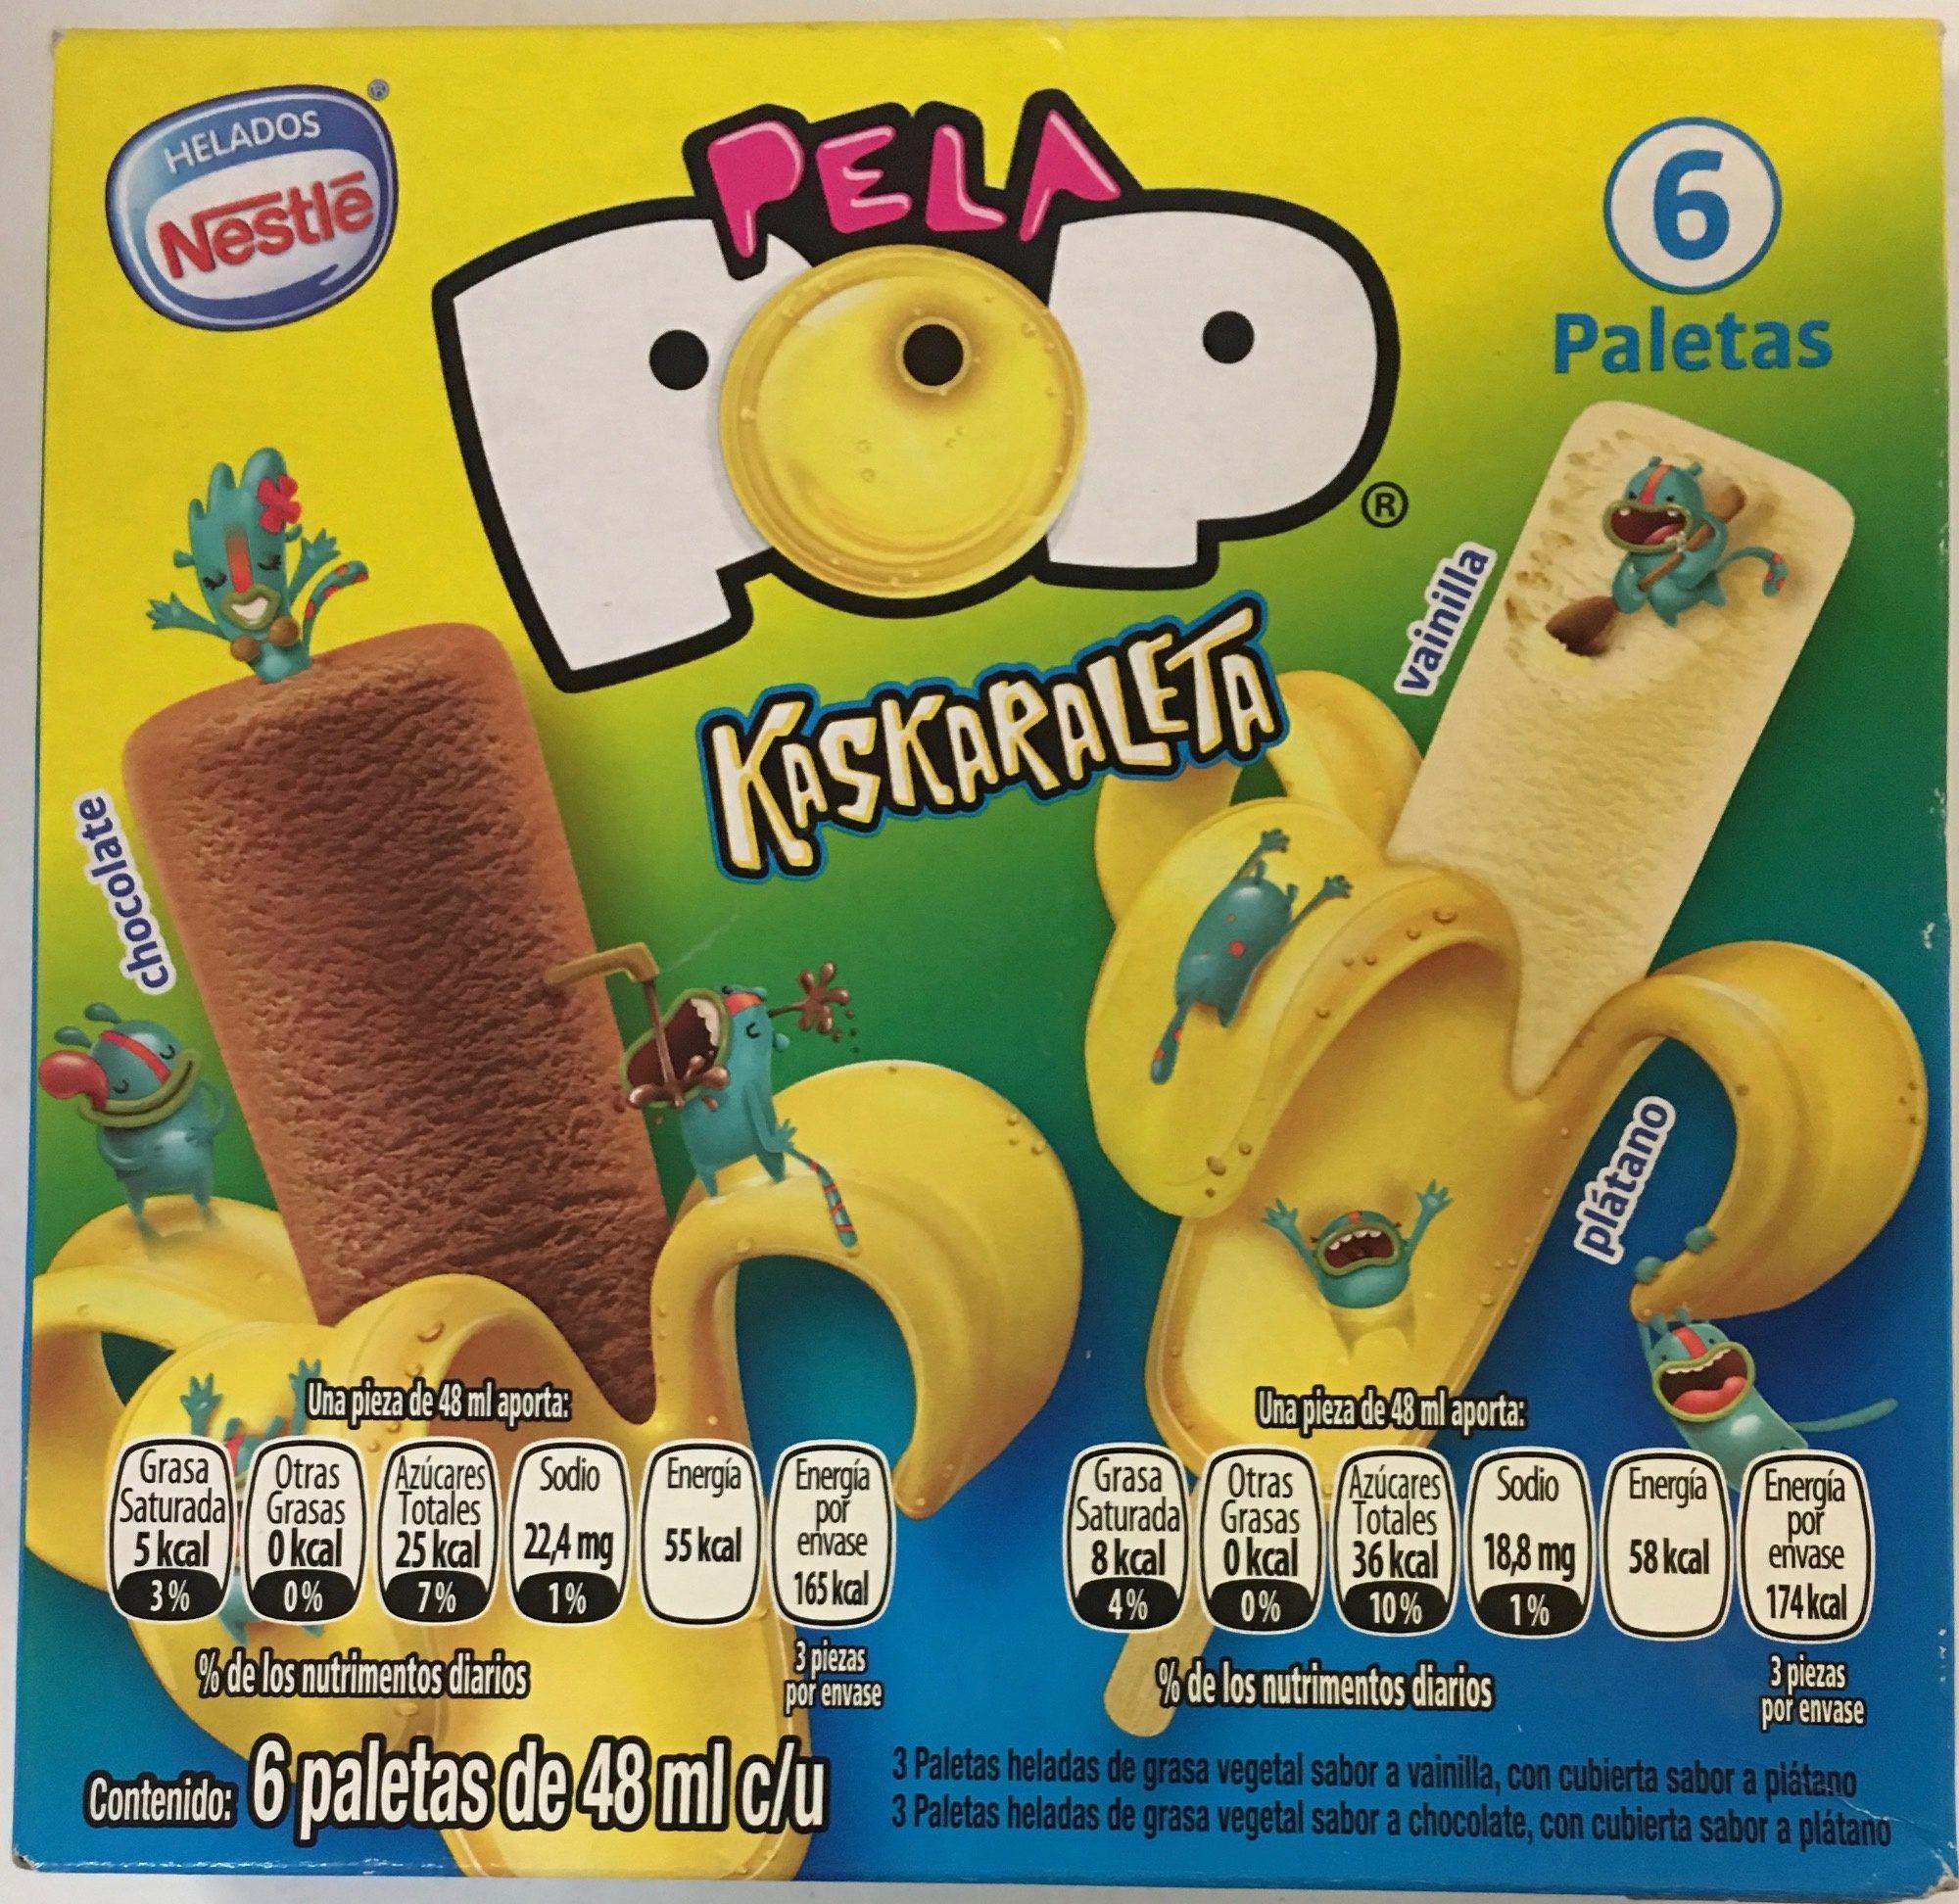 Pela Pop Kaskaraleta vainilla - Product - es